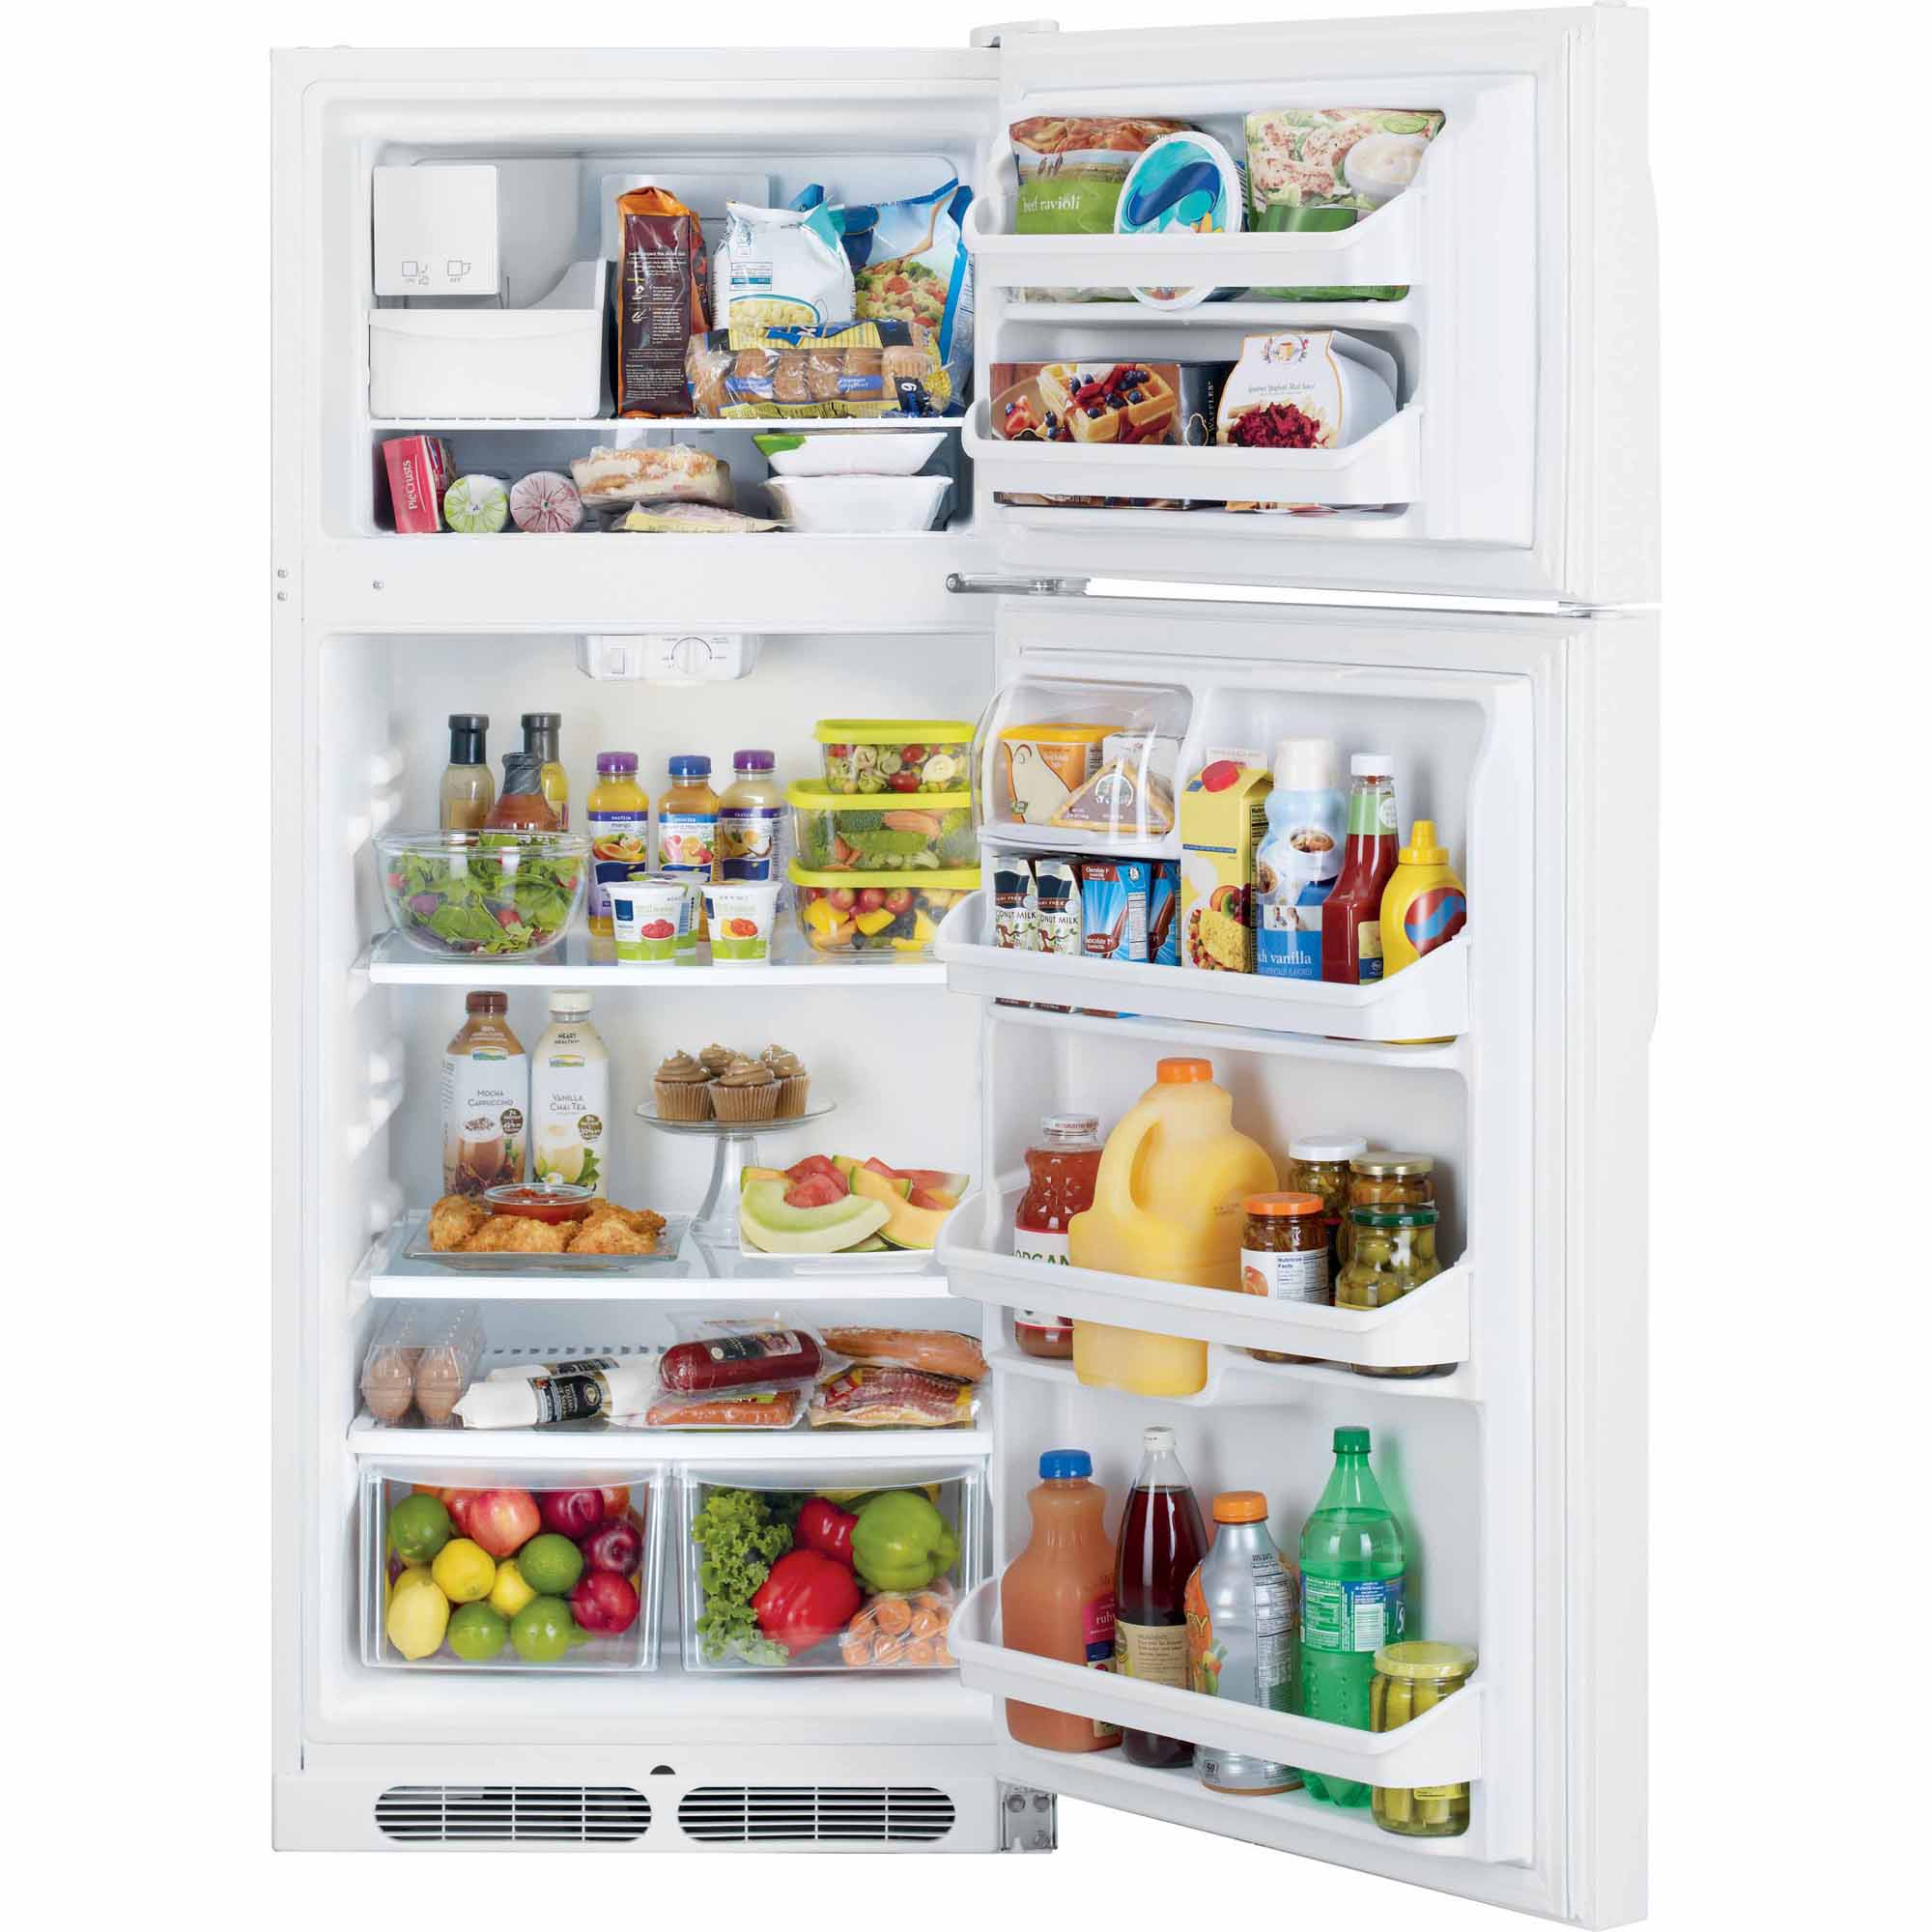 Kenmore 70402 16.3 cu. ft. Top Freezer Refrigerator - White